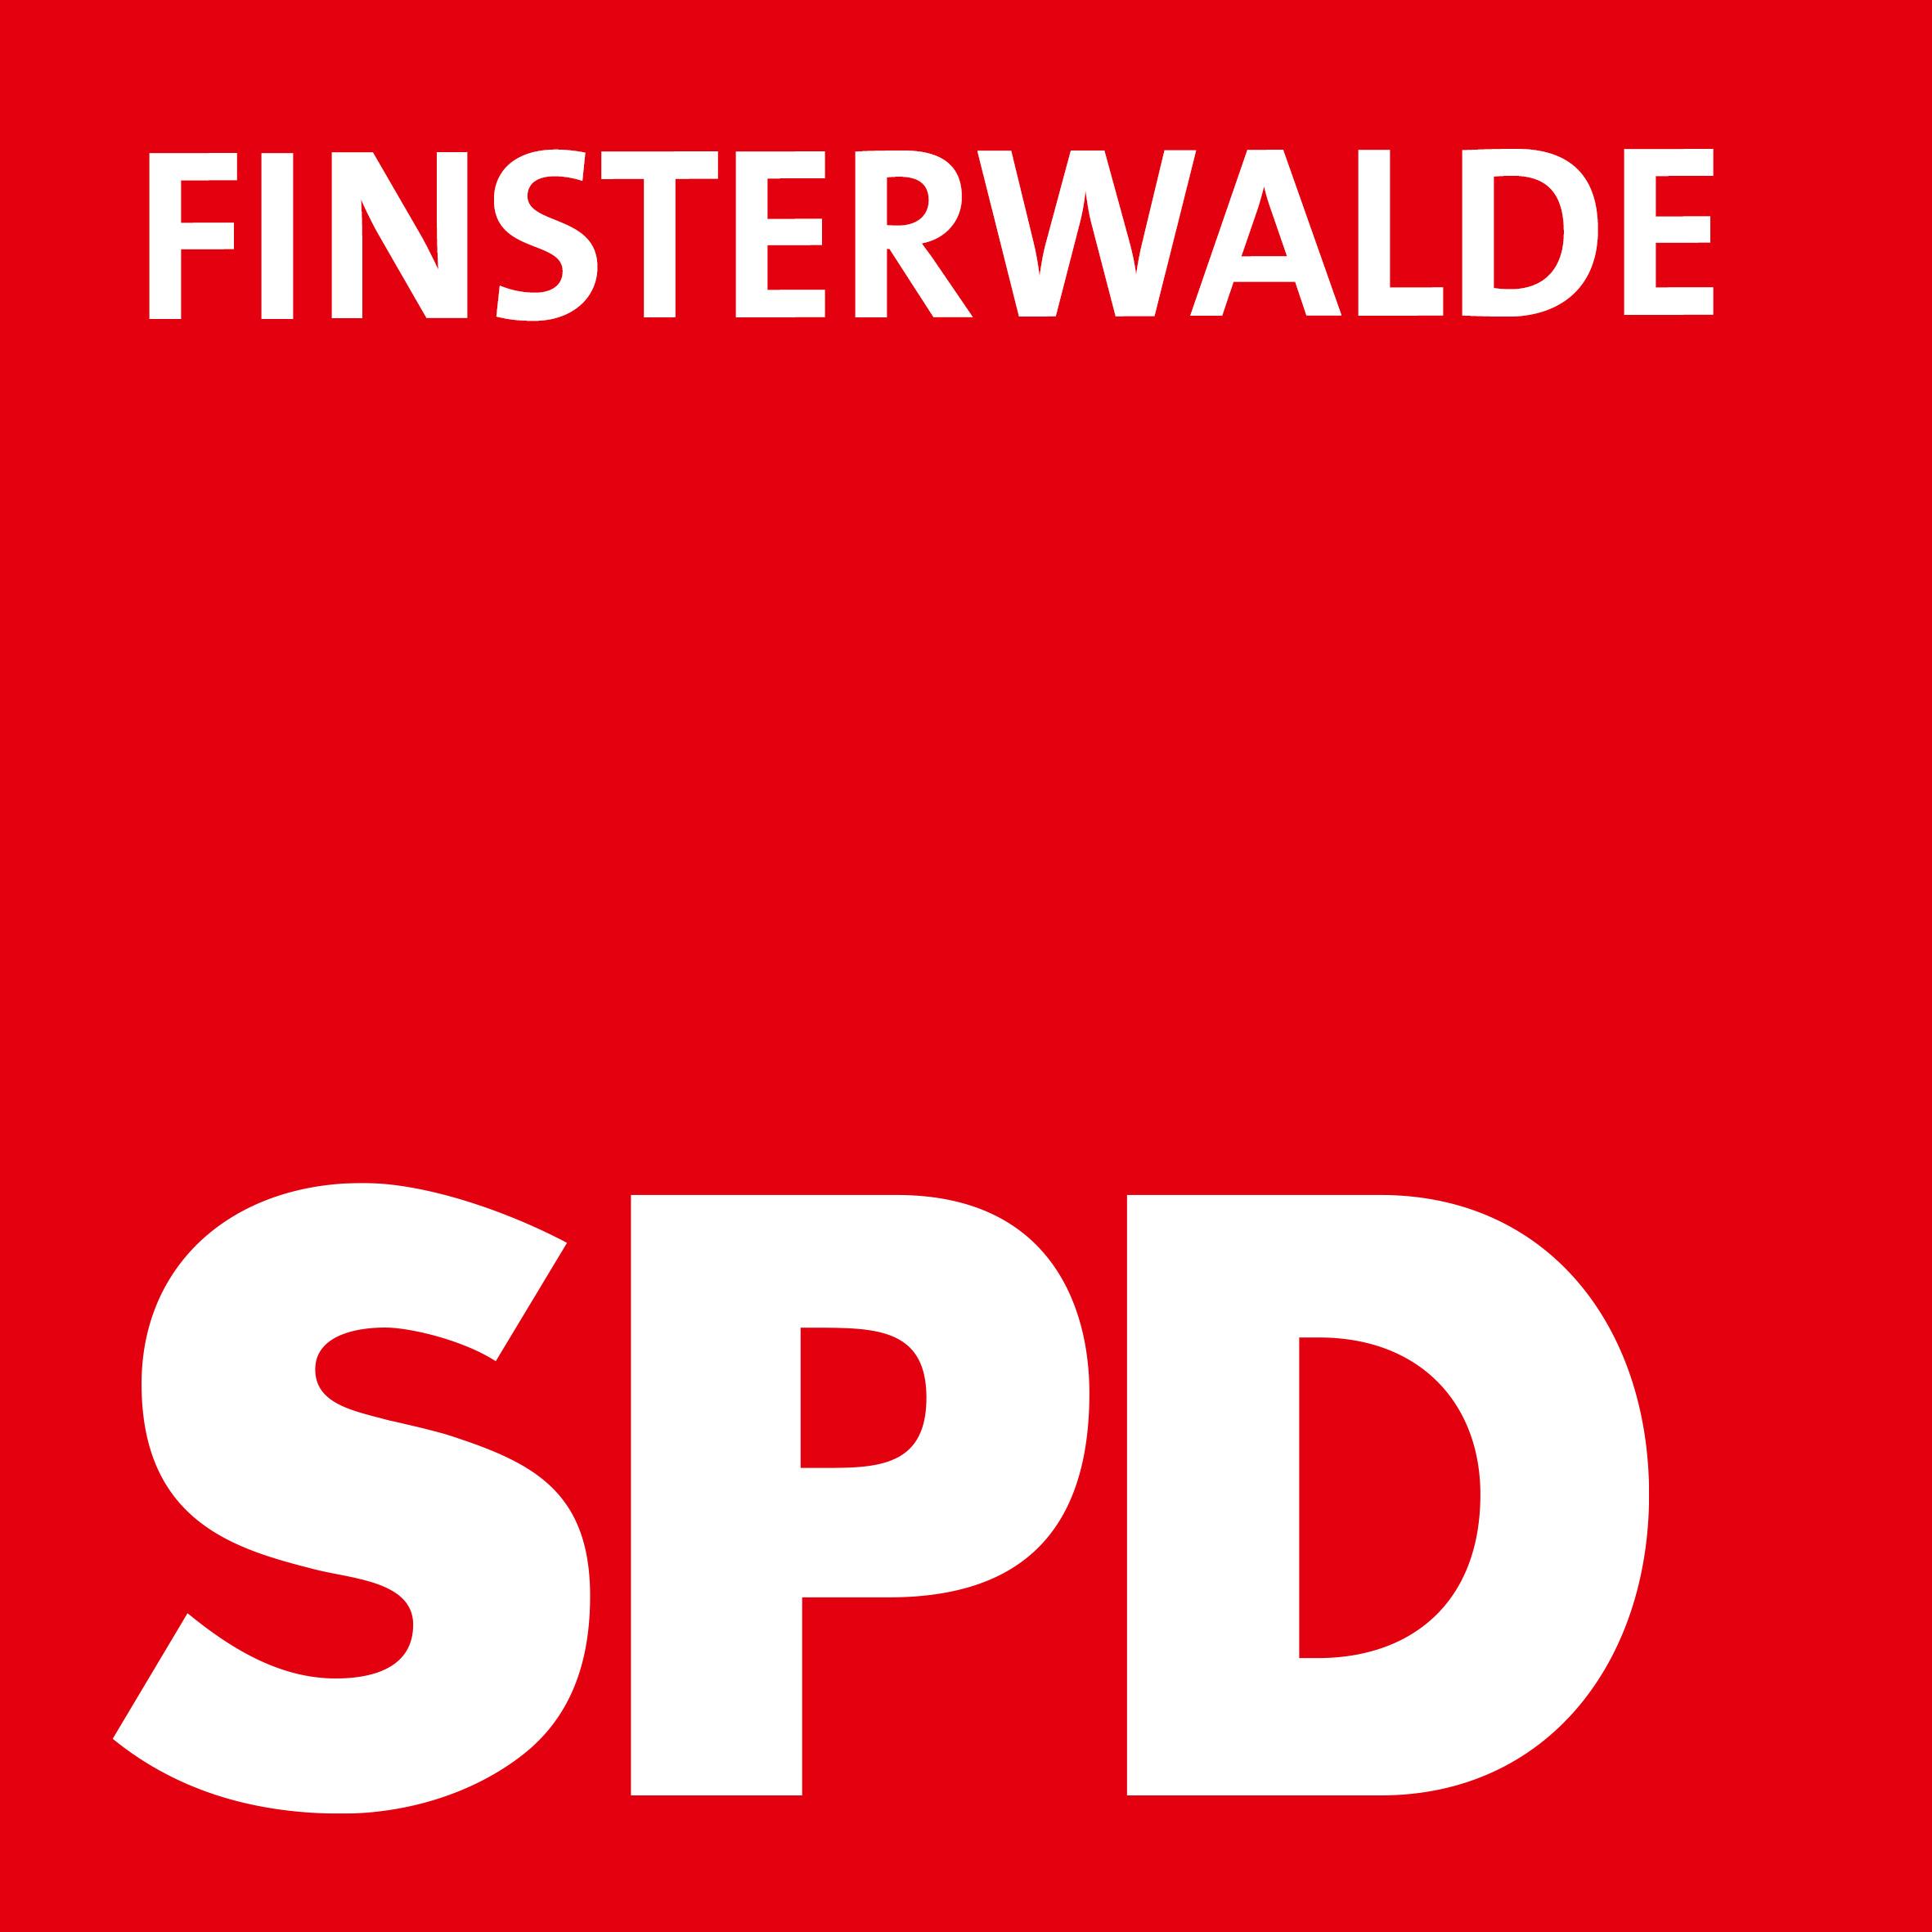 SPD Finsterwalde